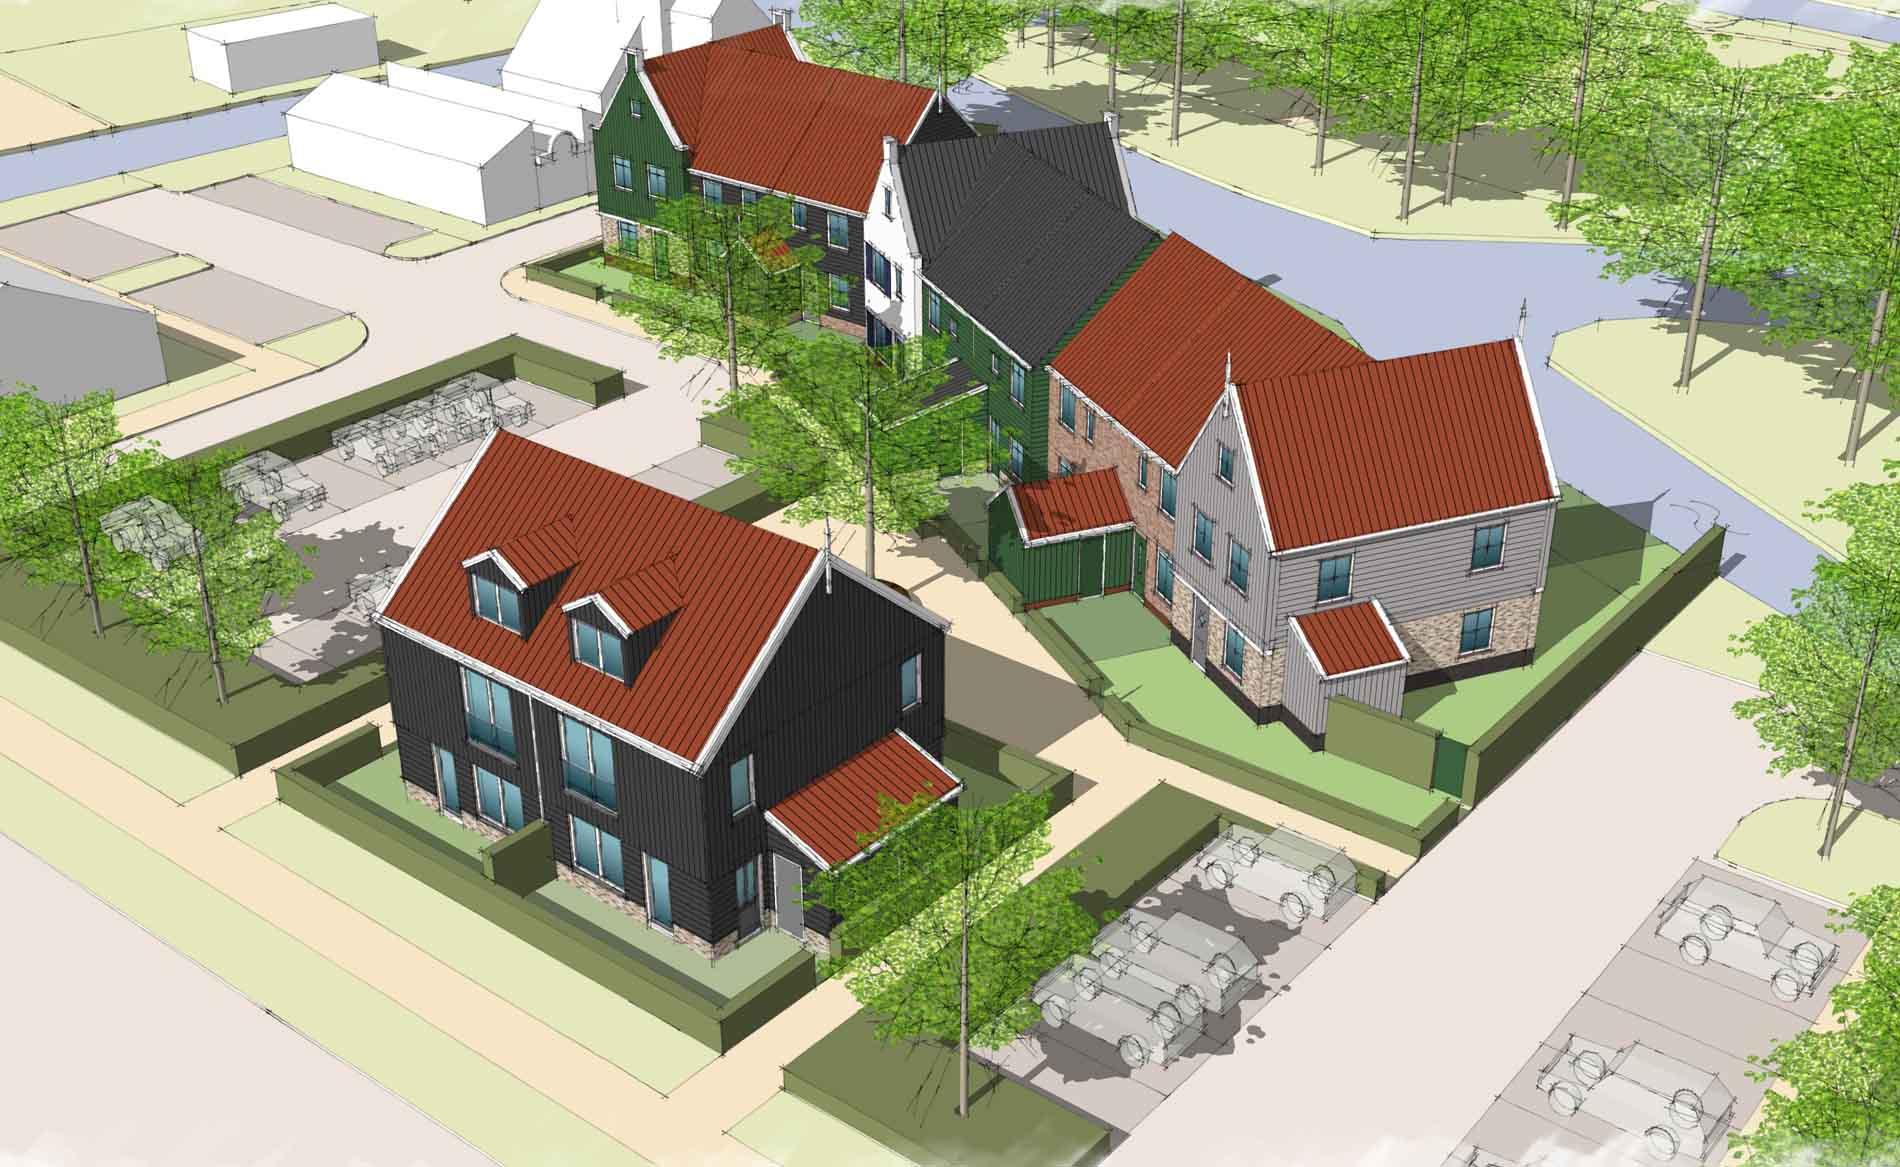 architect dorps wonen bouwen woningbouw Sloep De Rijp BBHD architecten